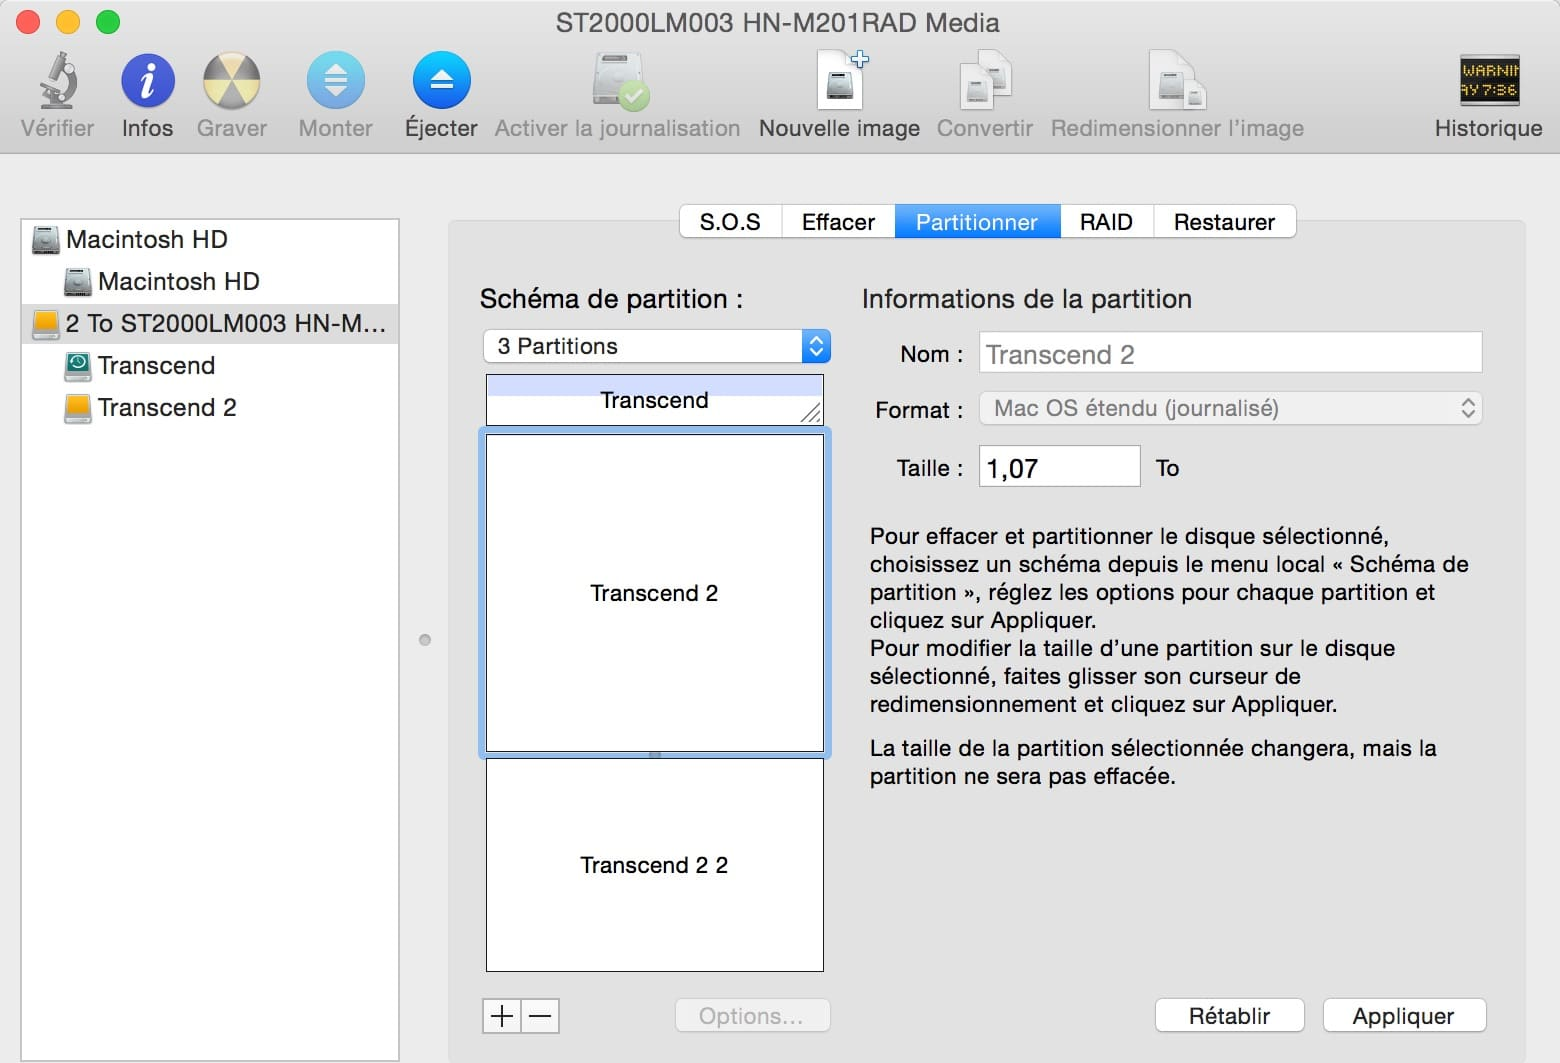 creer image disque dur mac